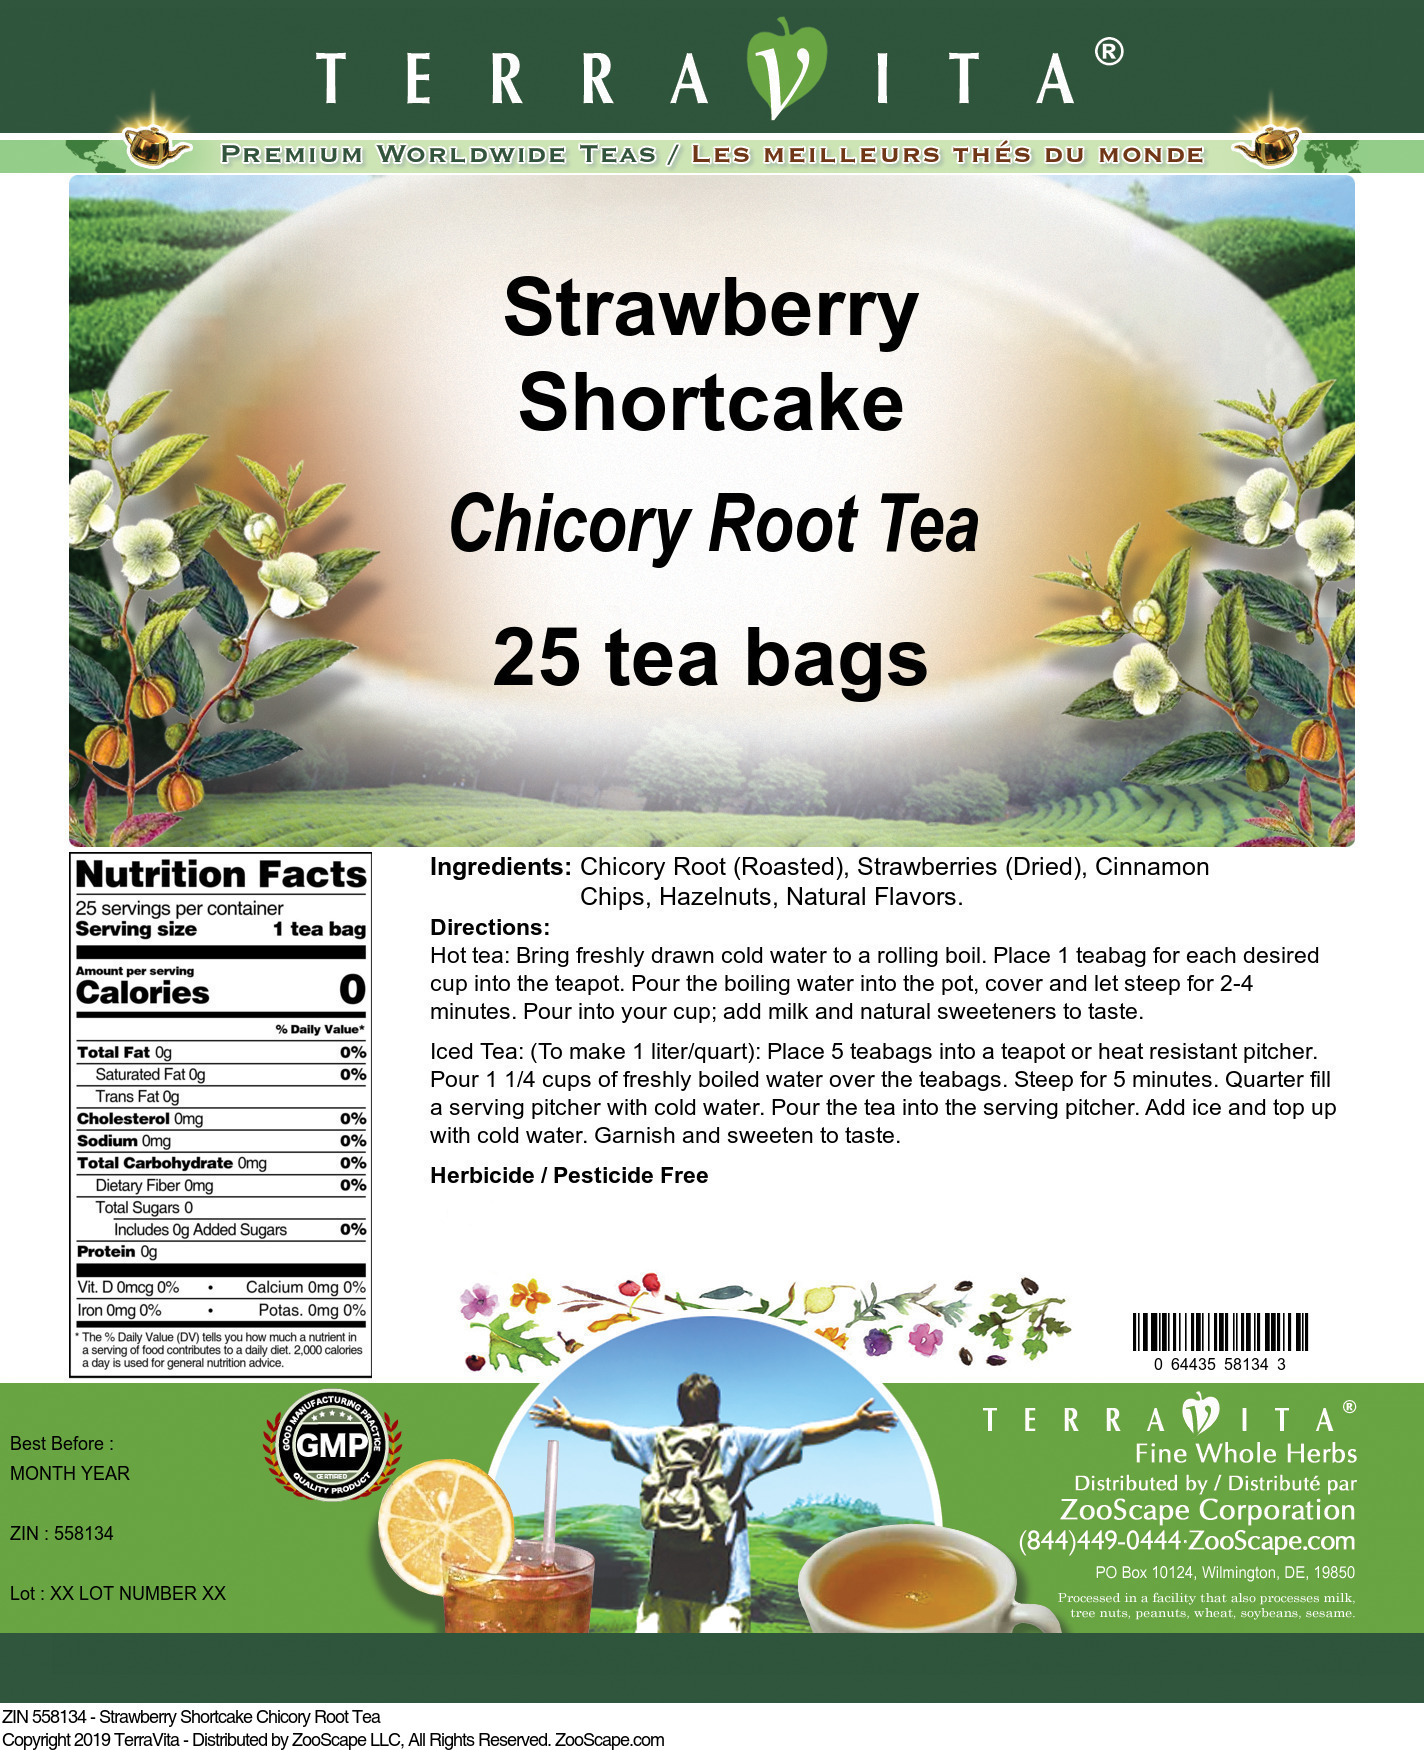 Strawberry Shortcake Chicory Root Tea